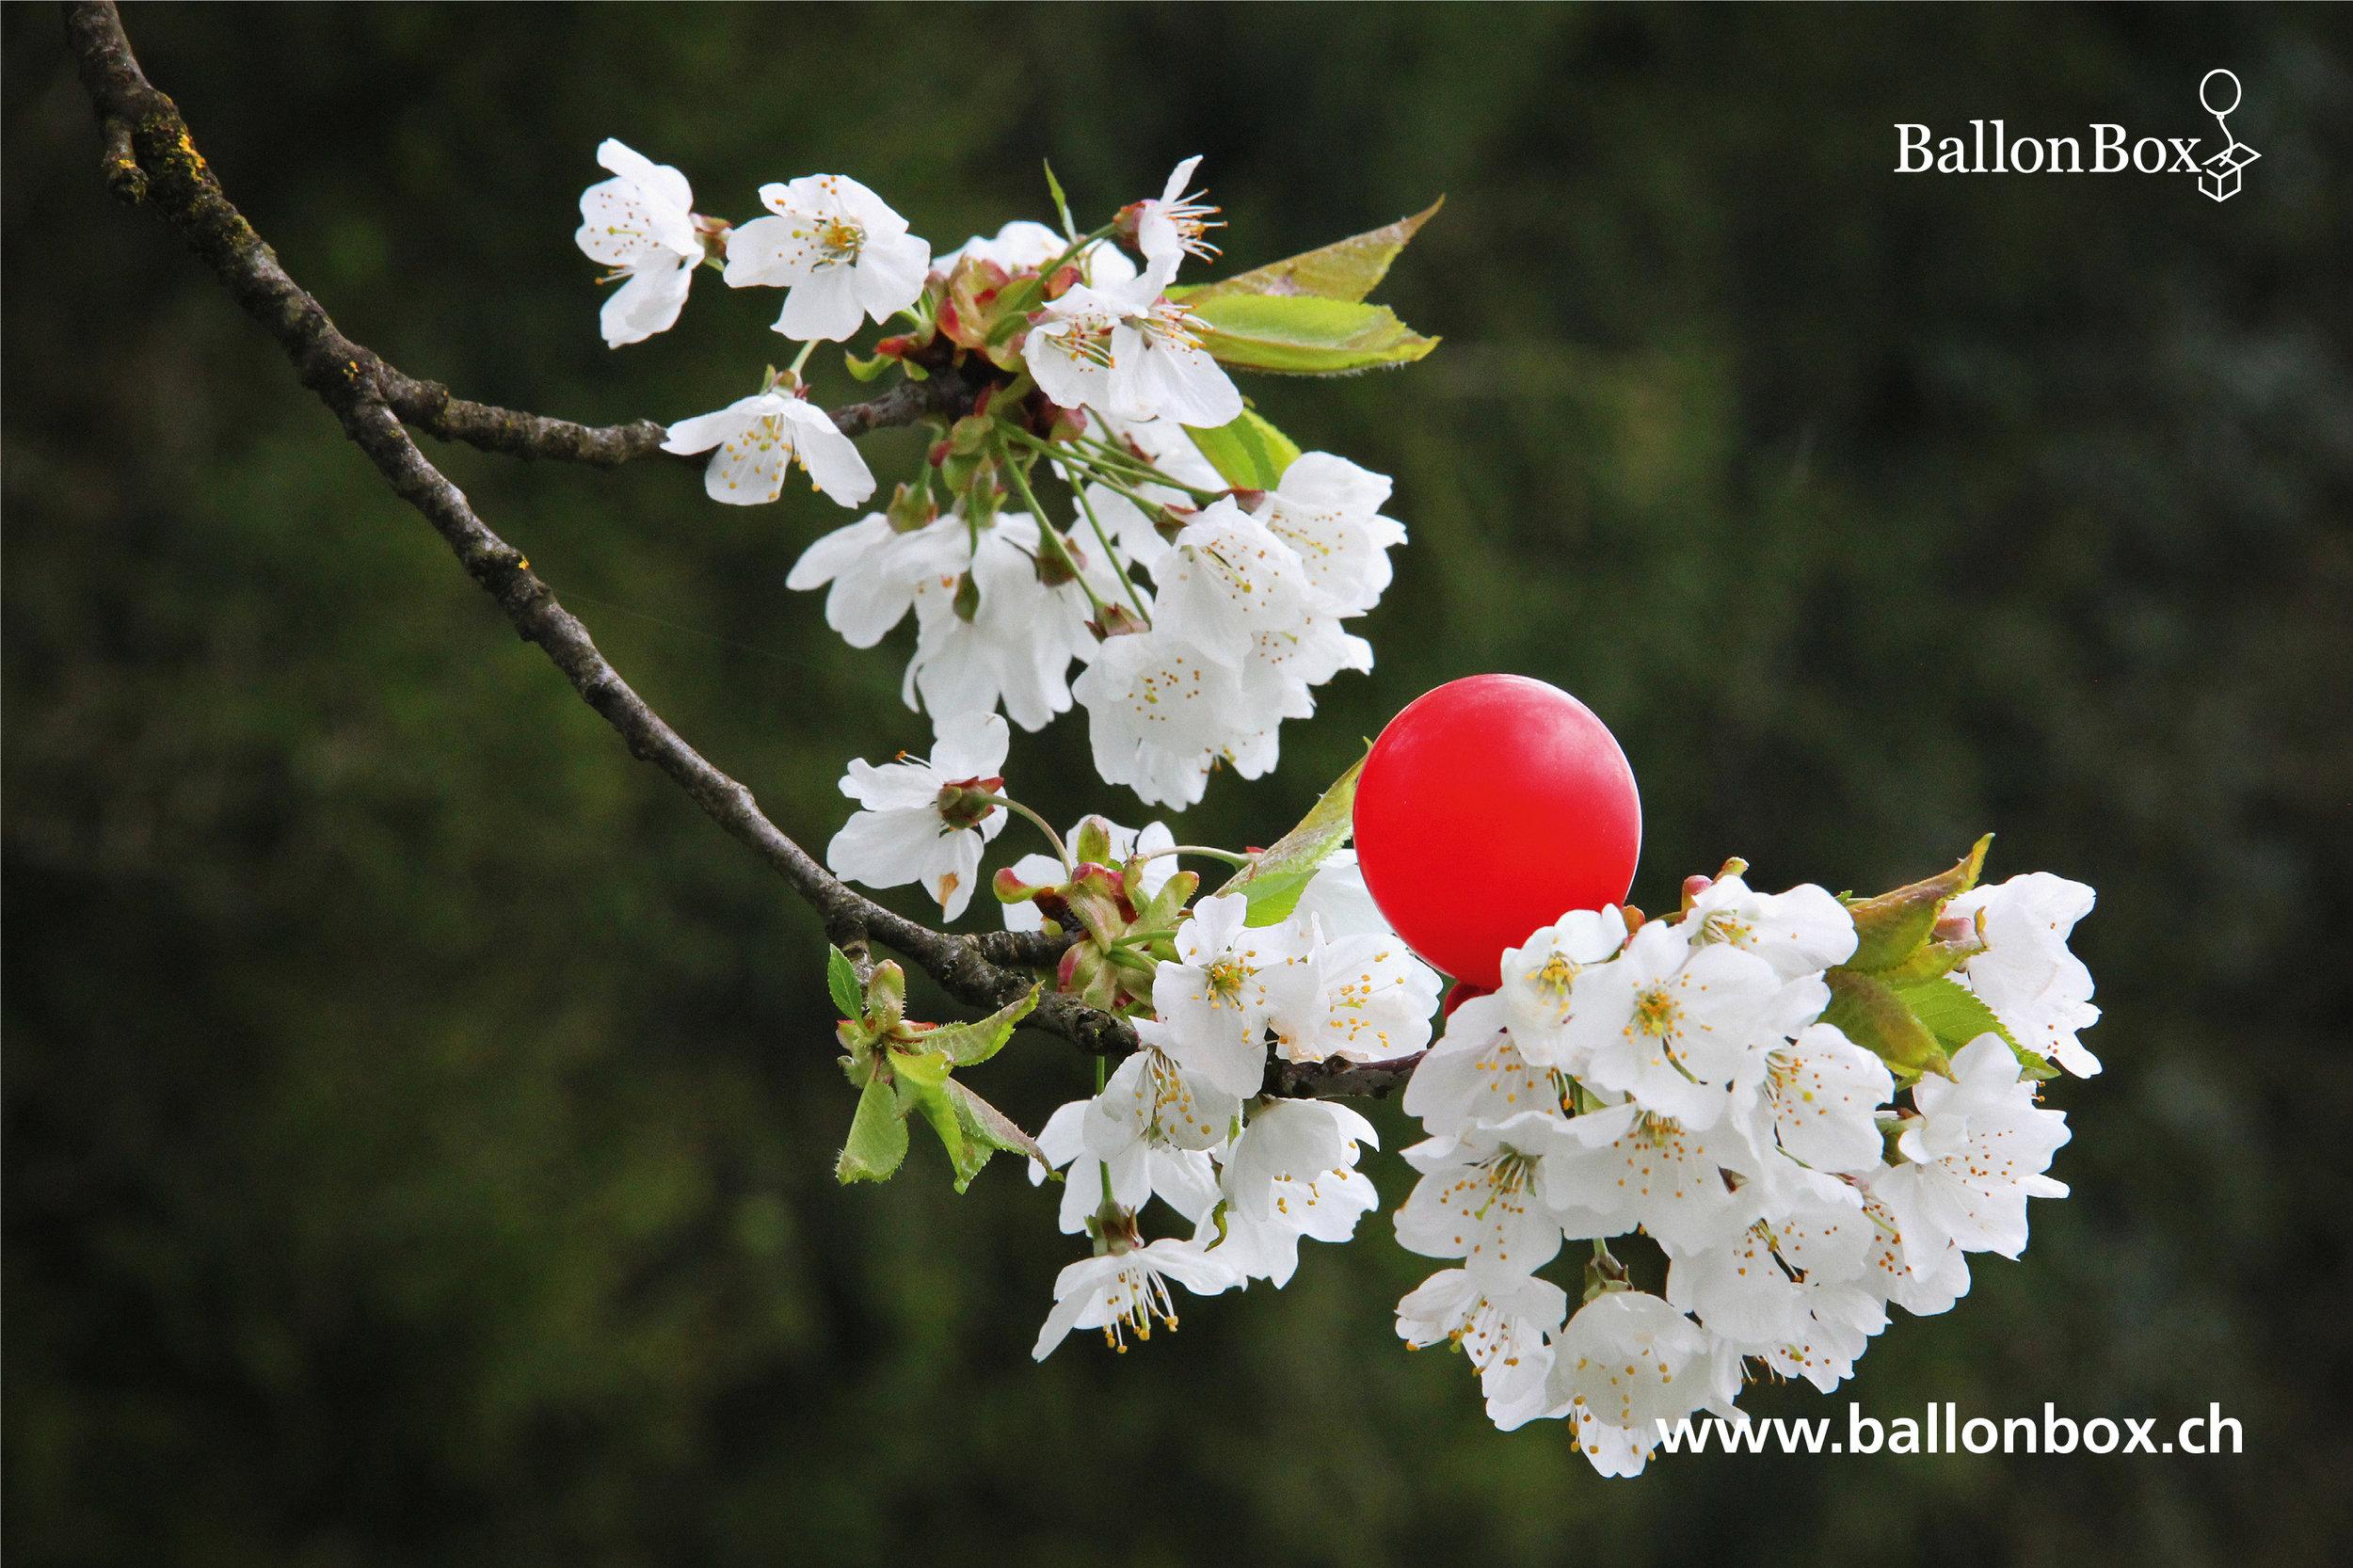 BallonBox_Kalender_17_04.jpg